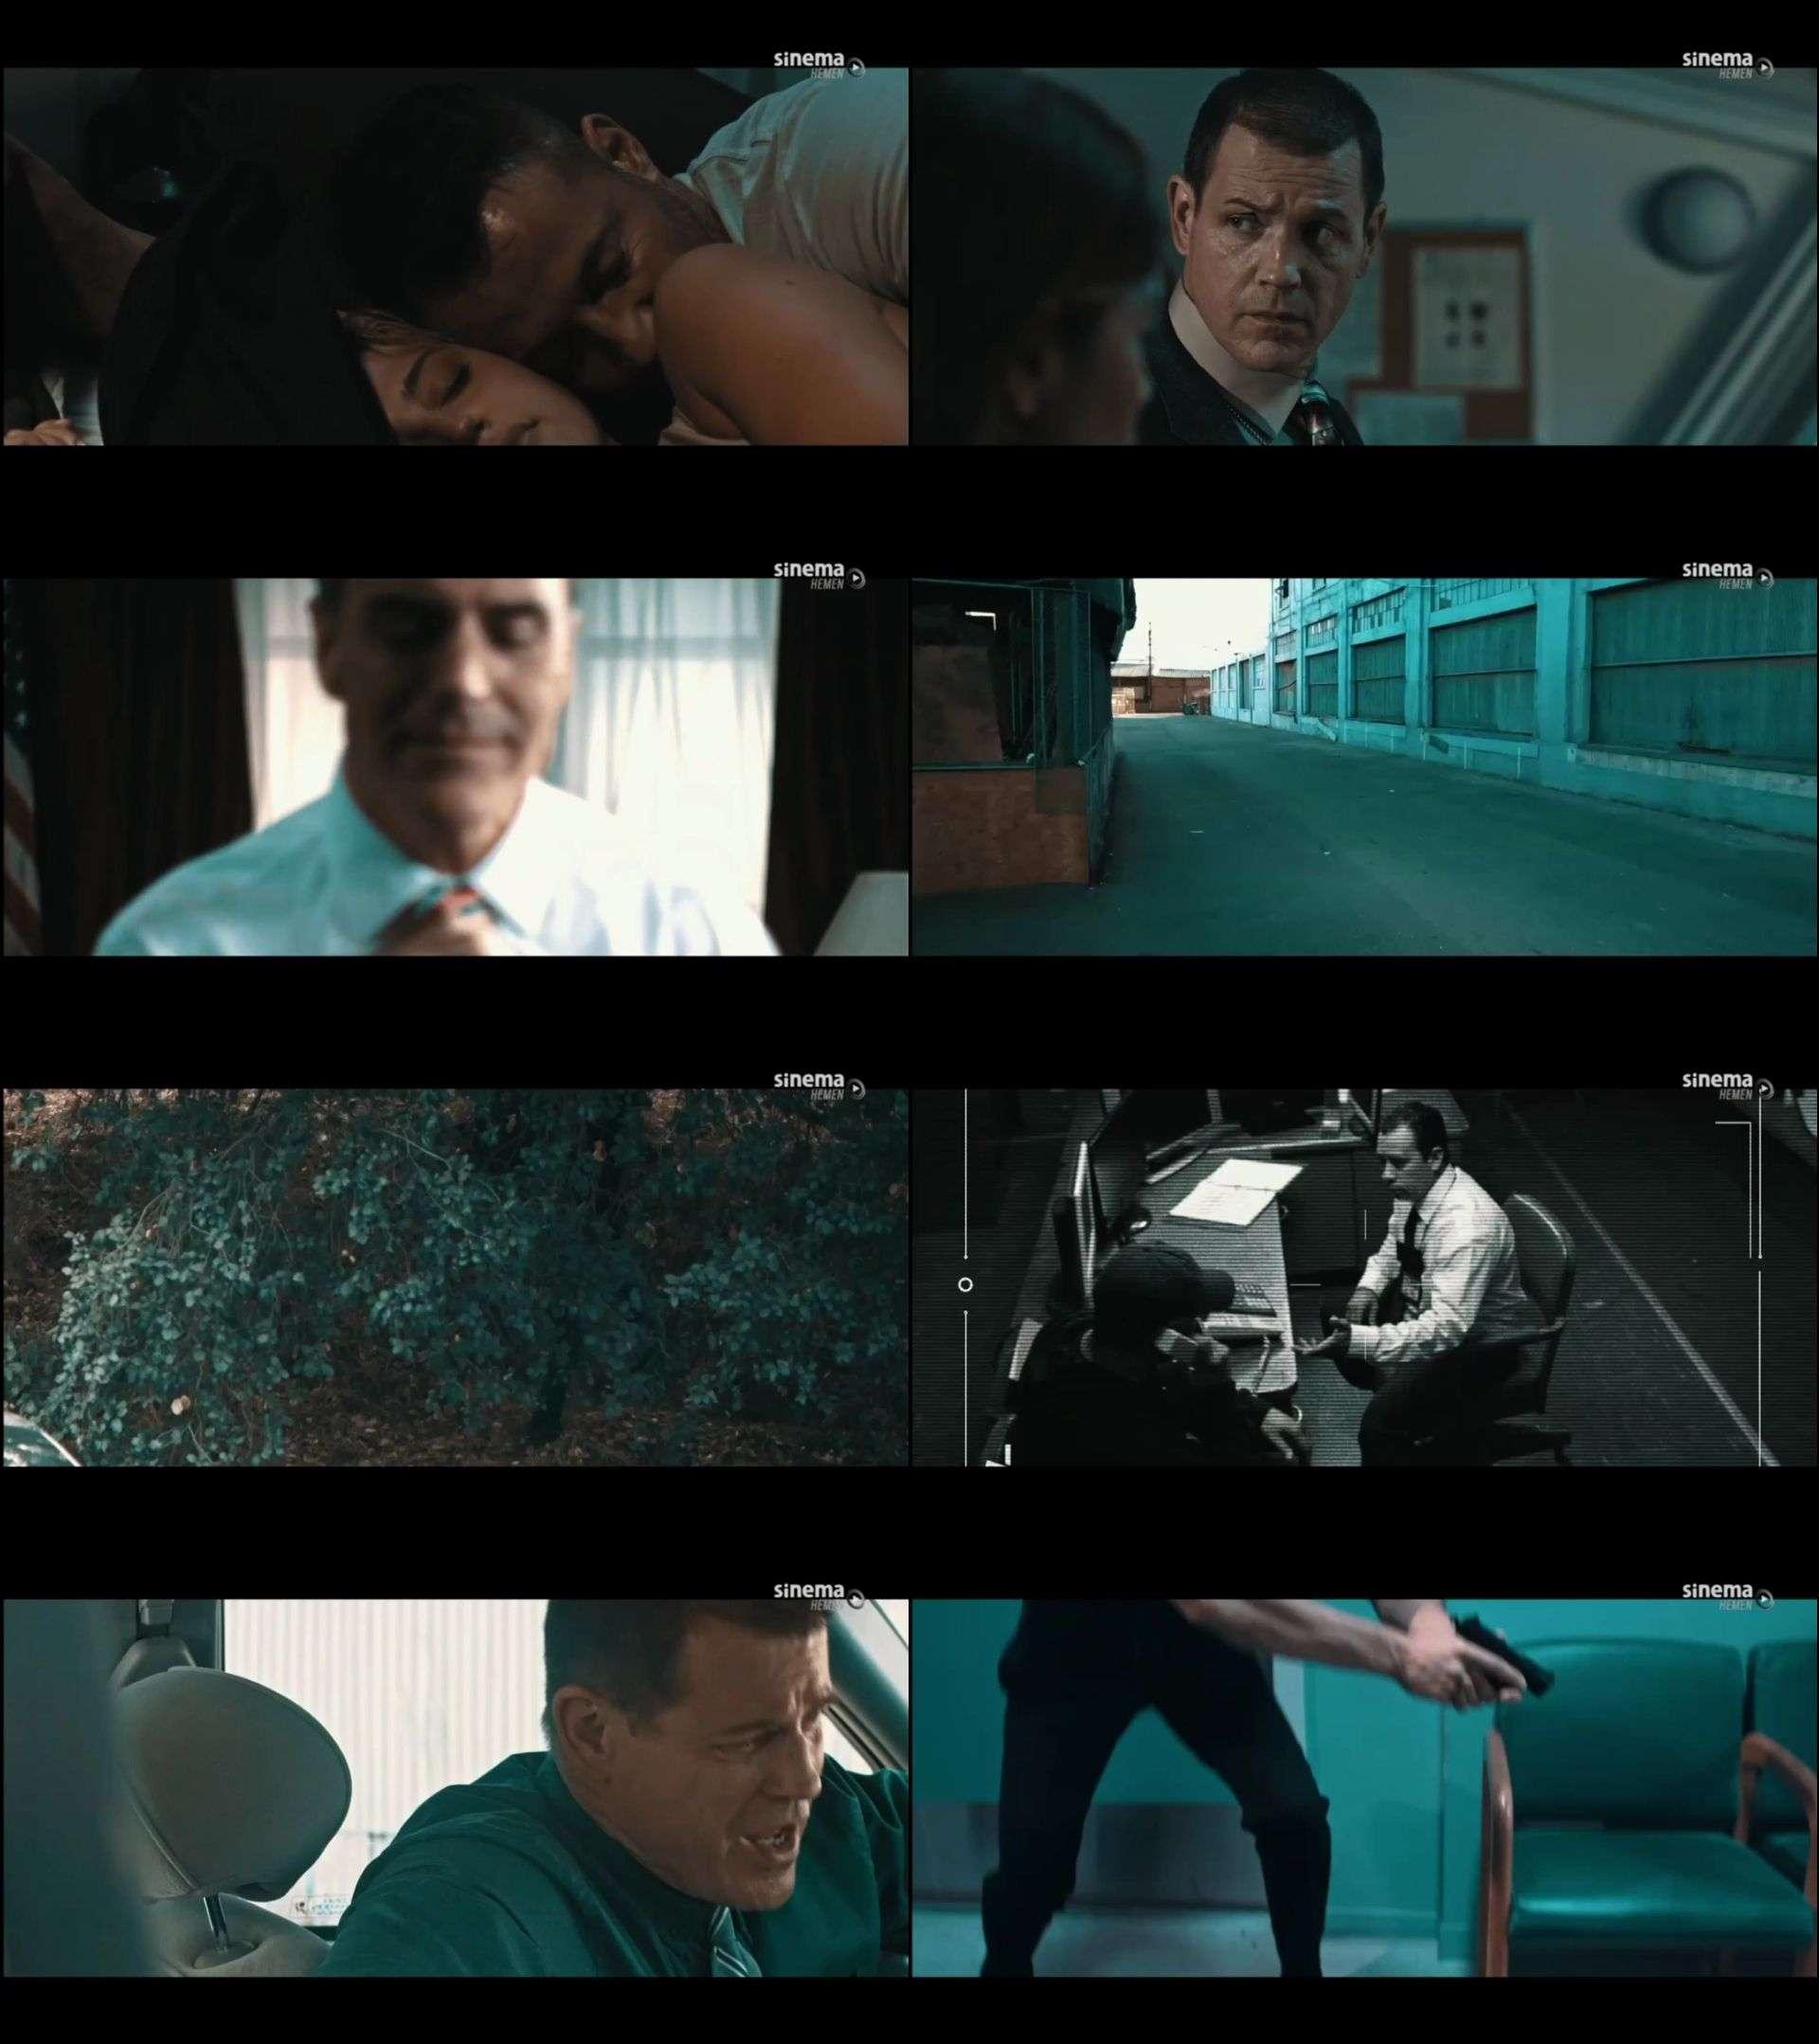 Görev Uğruna -  Decommissioned (2016) türkçe dublaj film indir